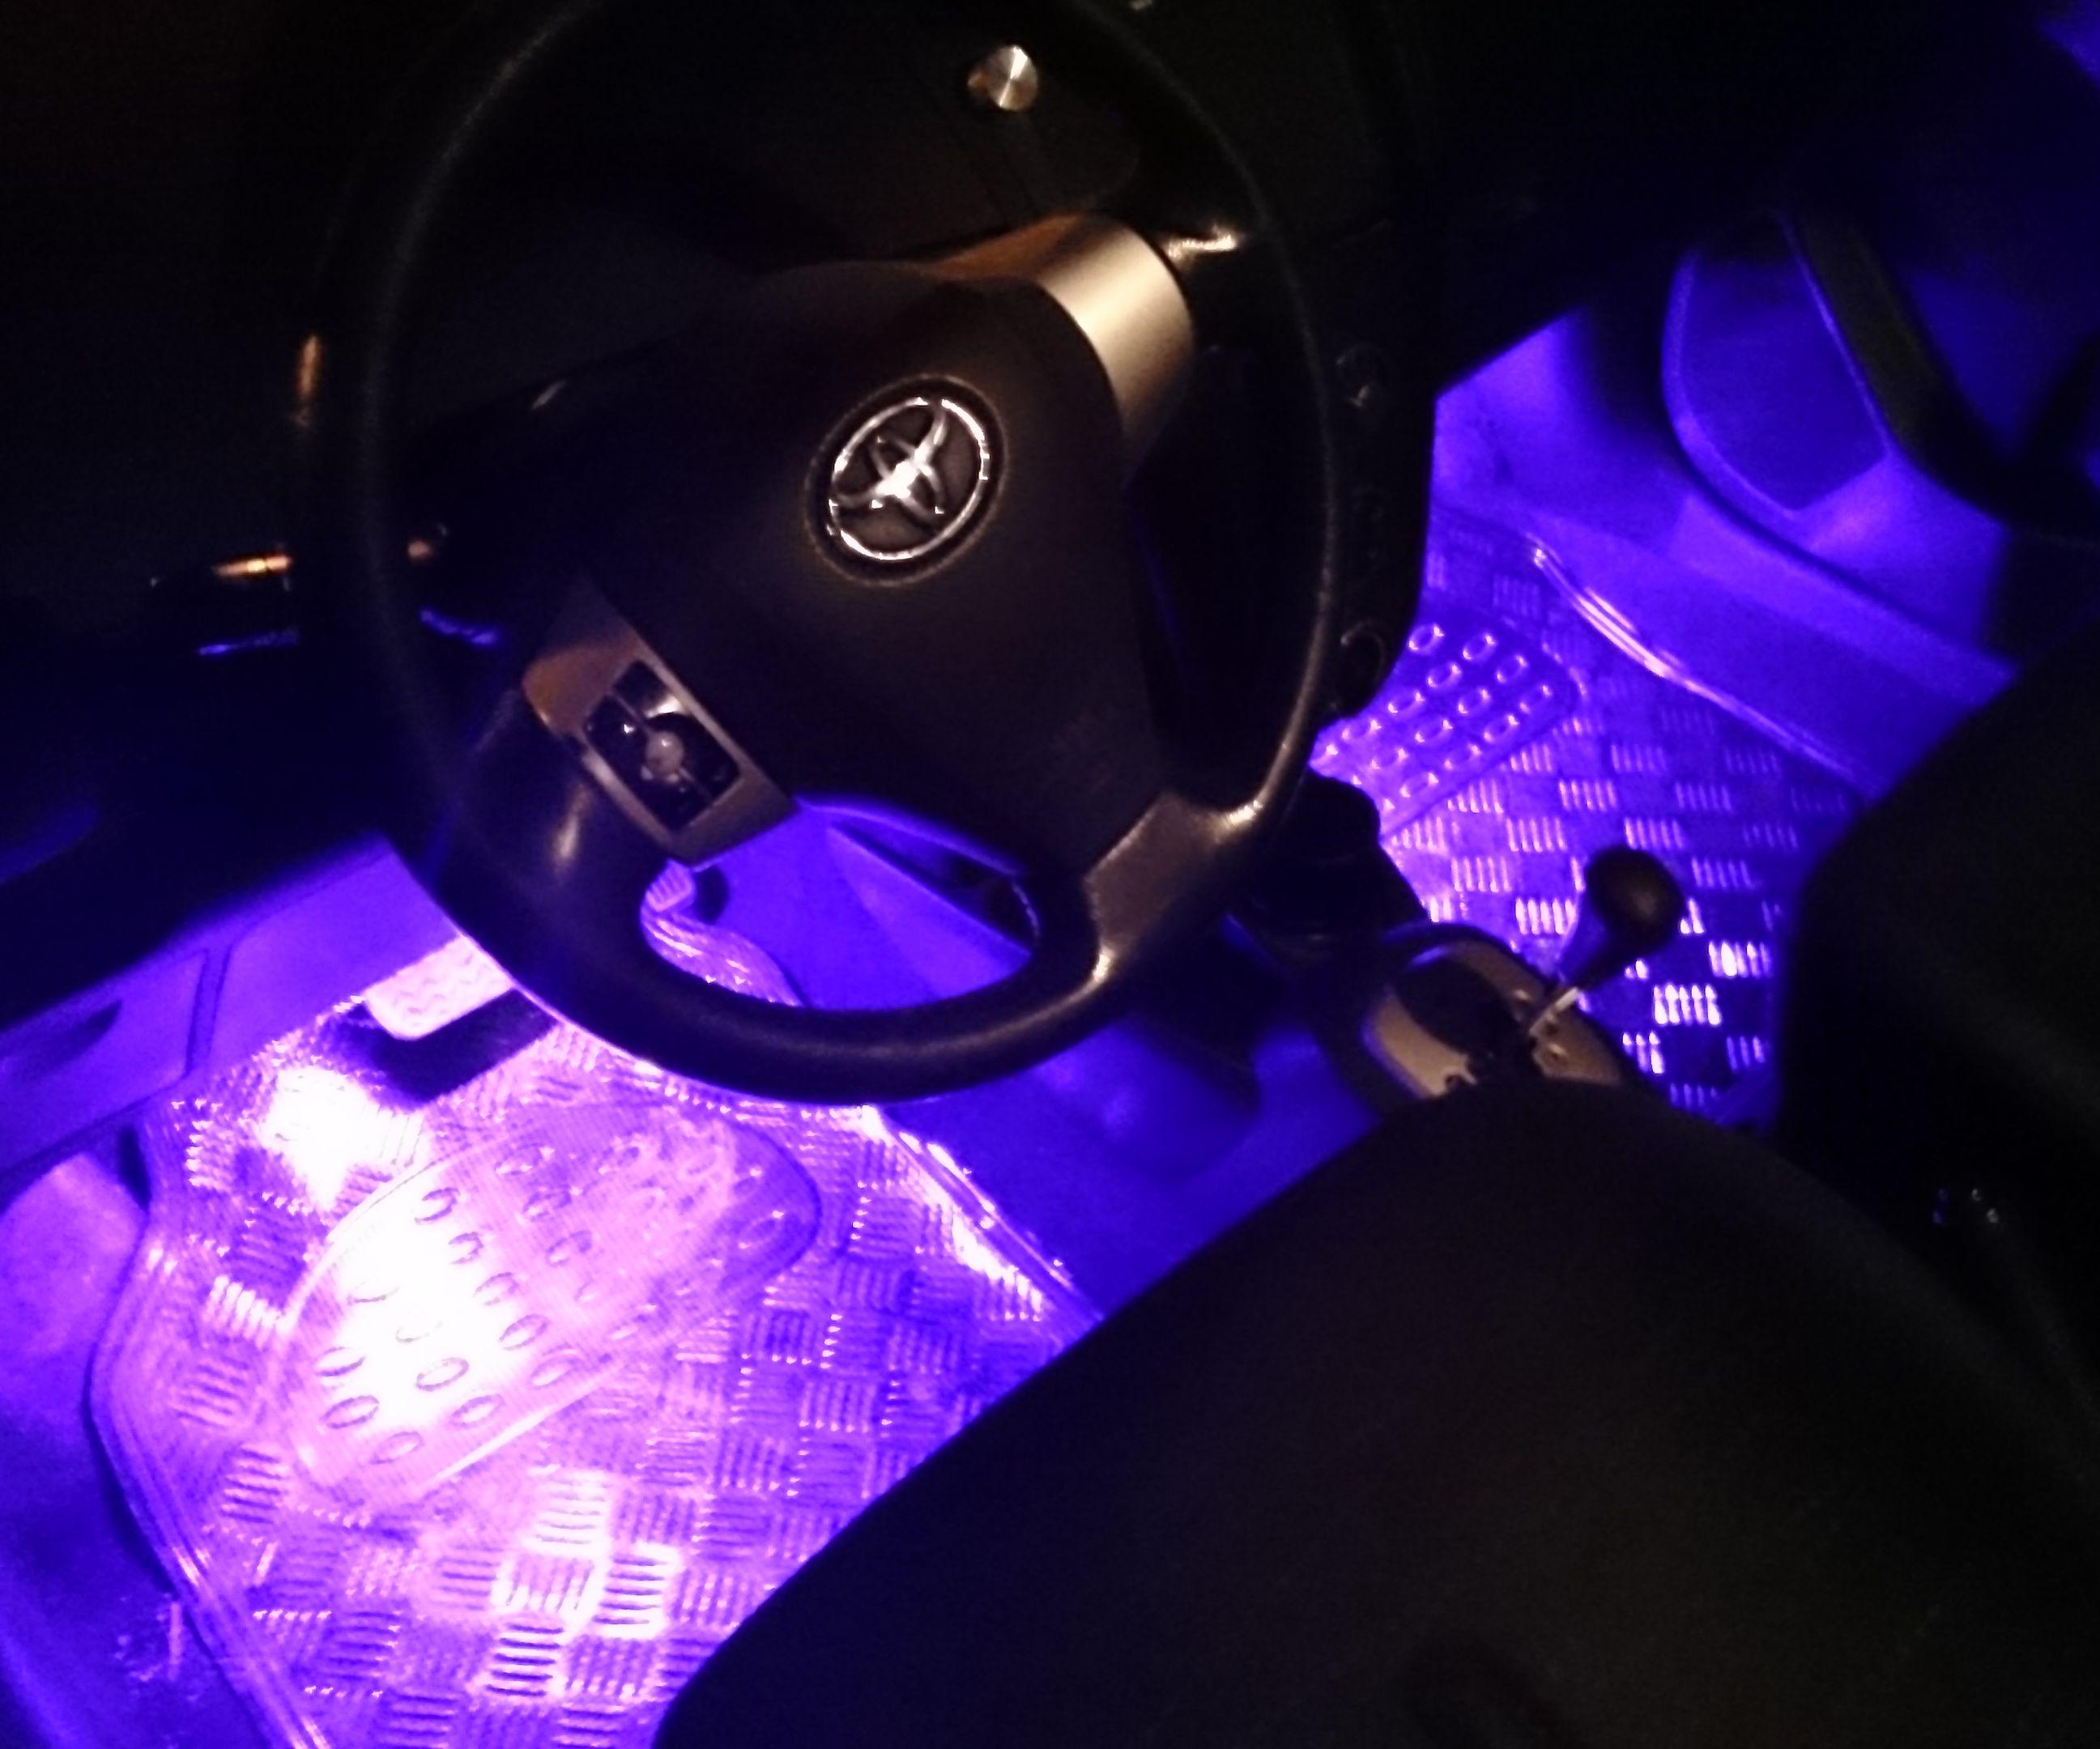 Arduino RGB Interior Car Lighting (Bluetooth - Android App)